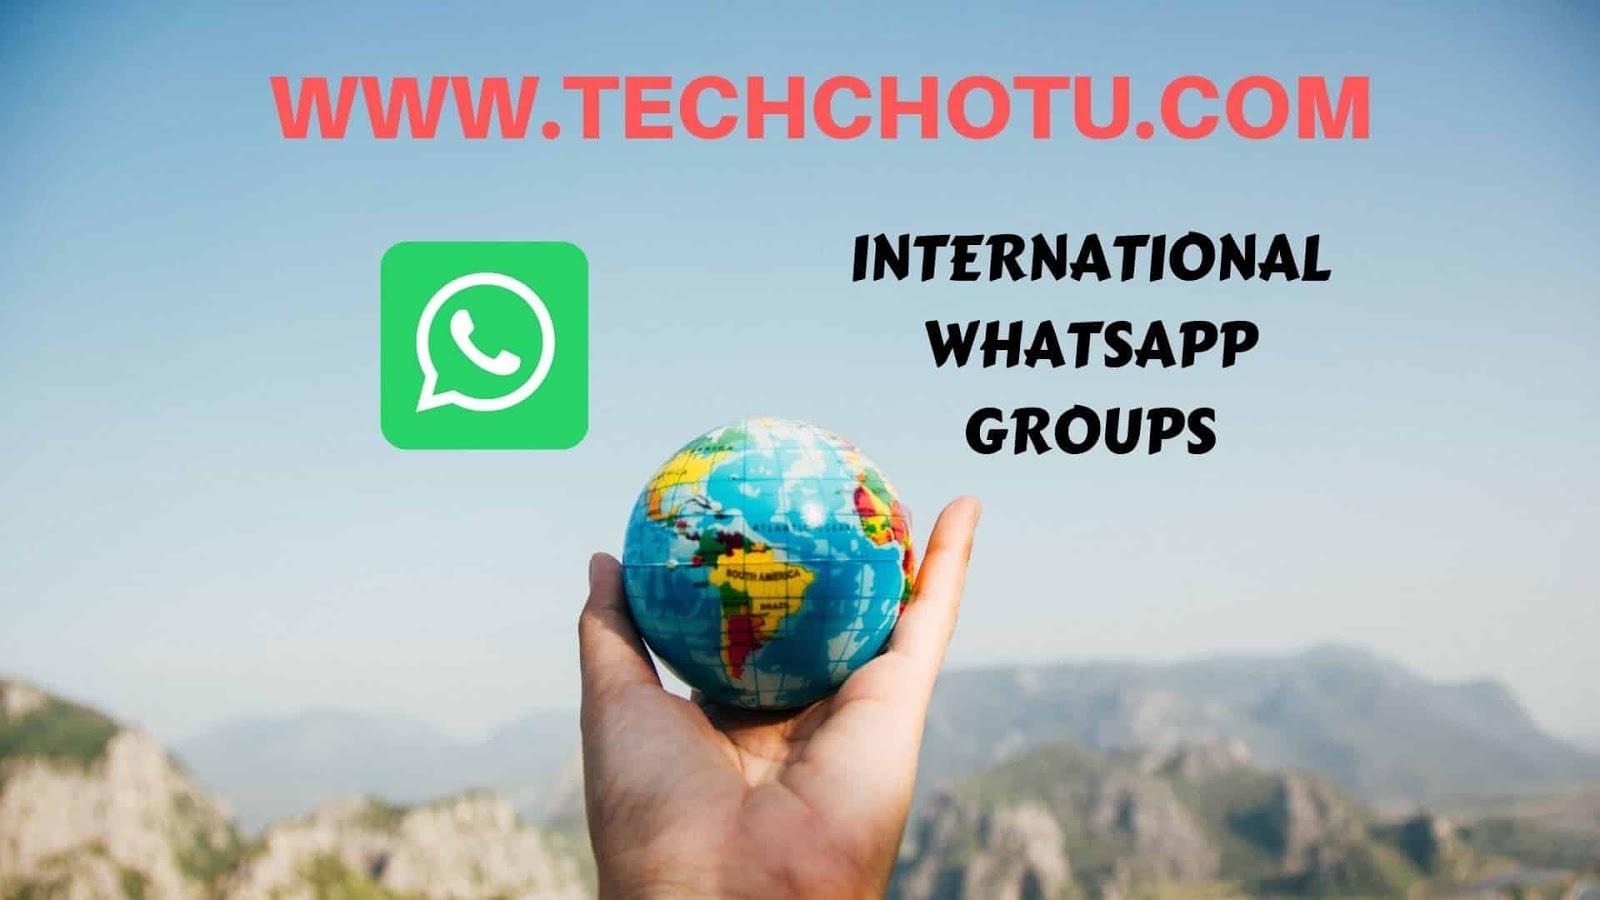 INTERNATIONAL WHATSAPP GROUP LINKS - TECHCHOTU 2019